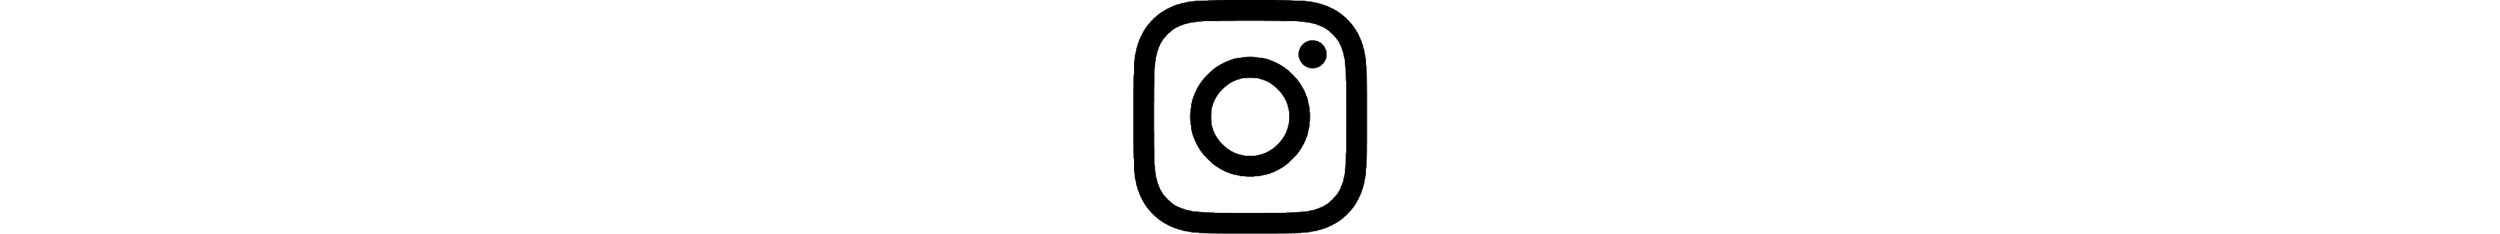 Instagram glyph logo.png